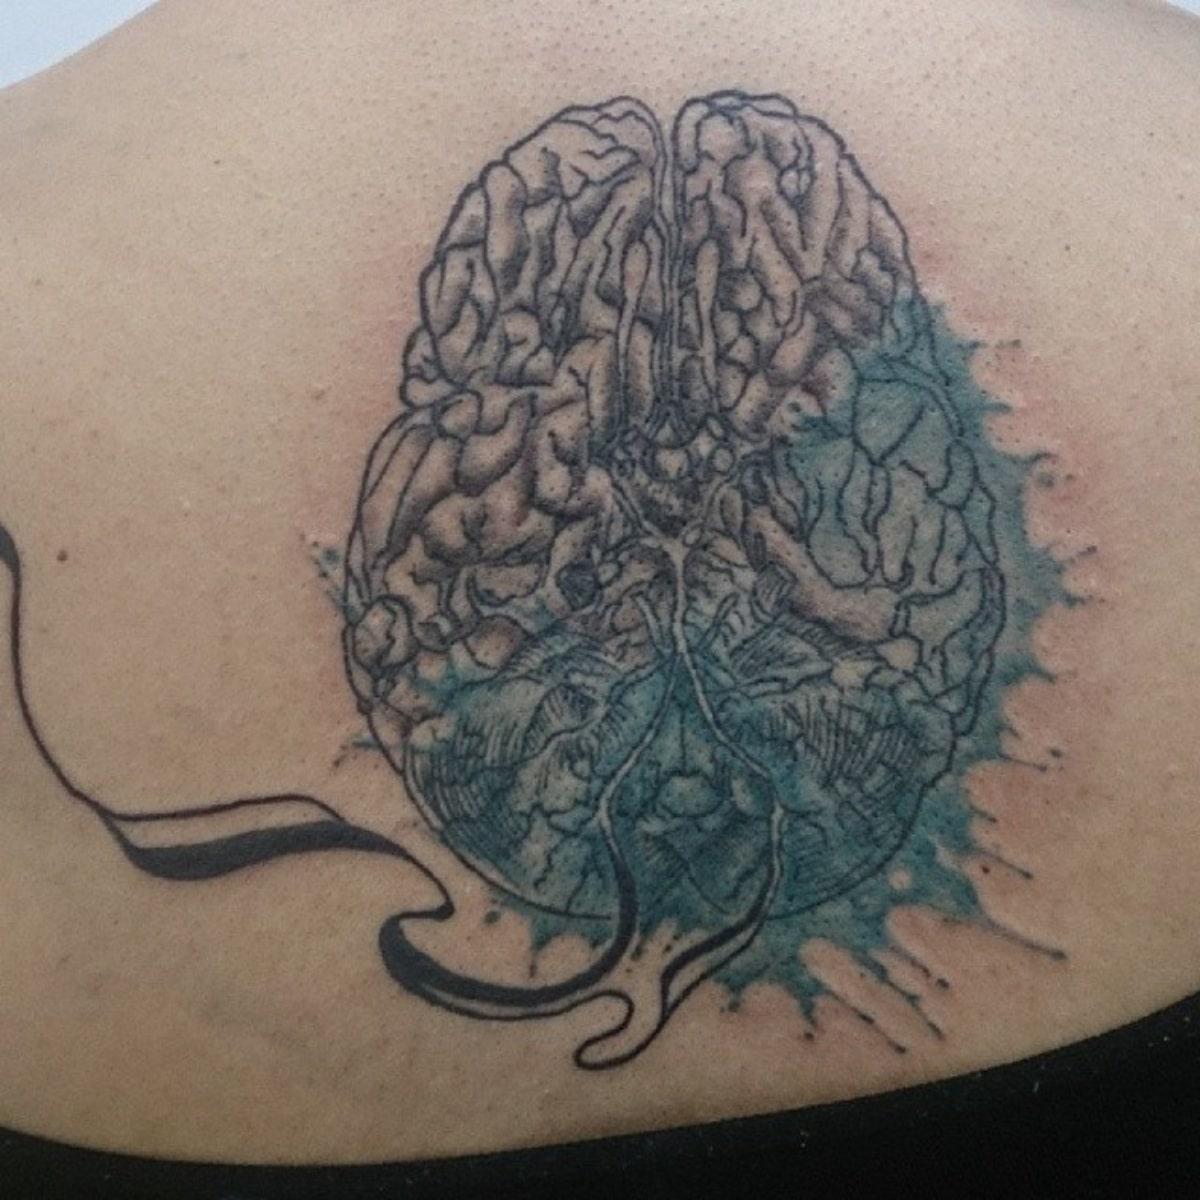 Tatuaje de cerebro solo